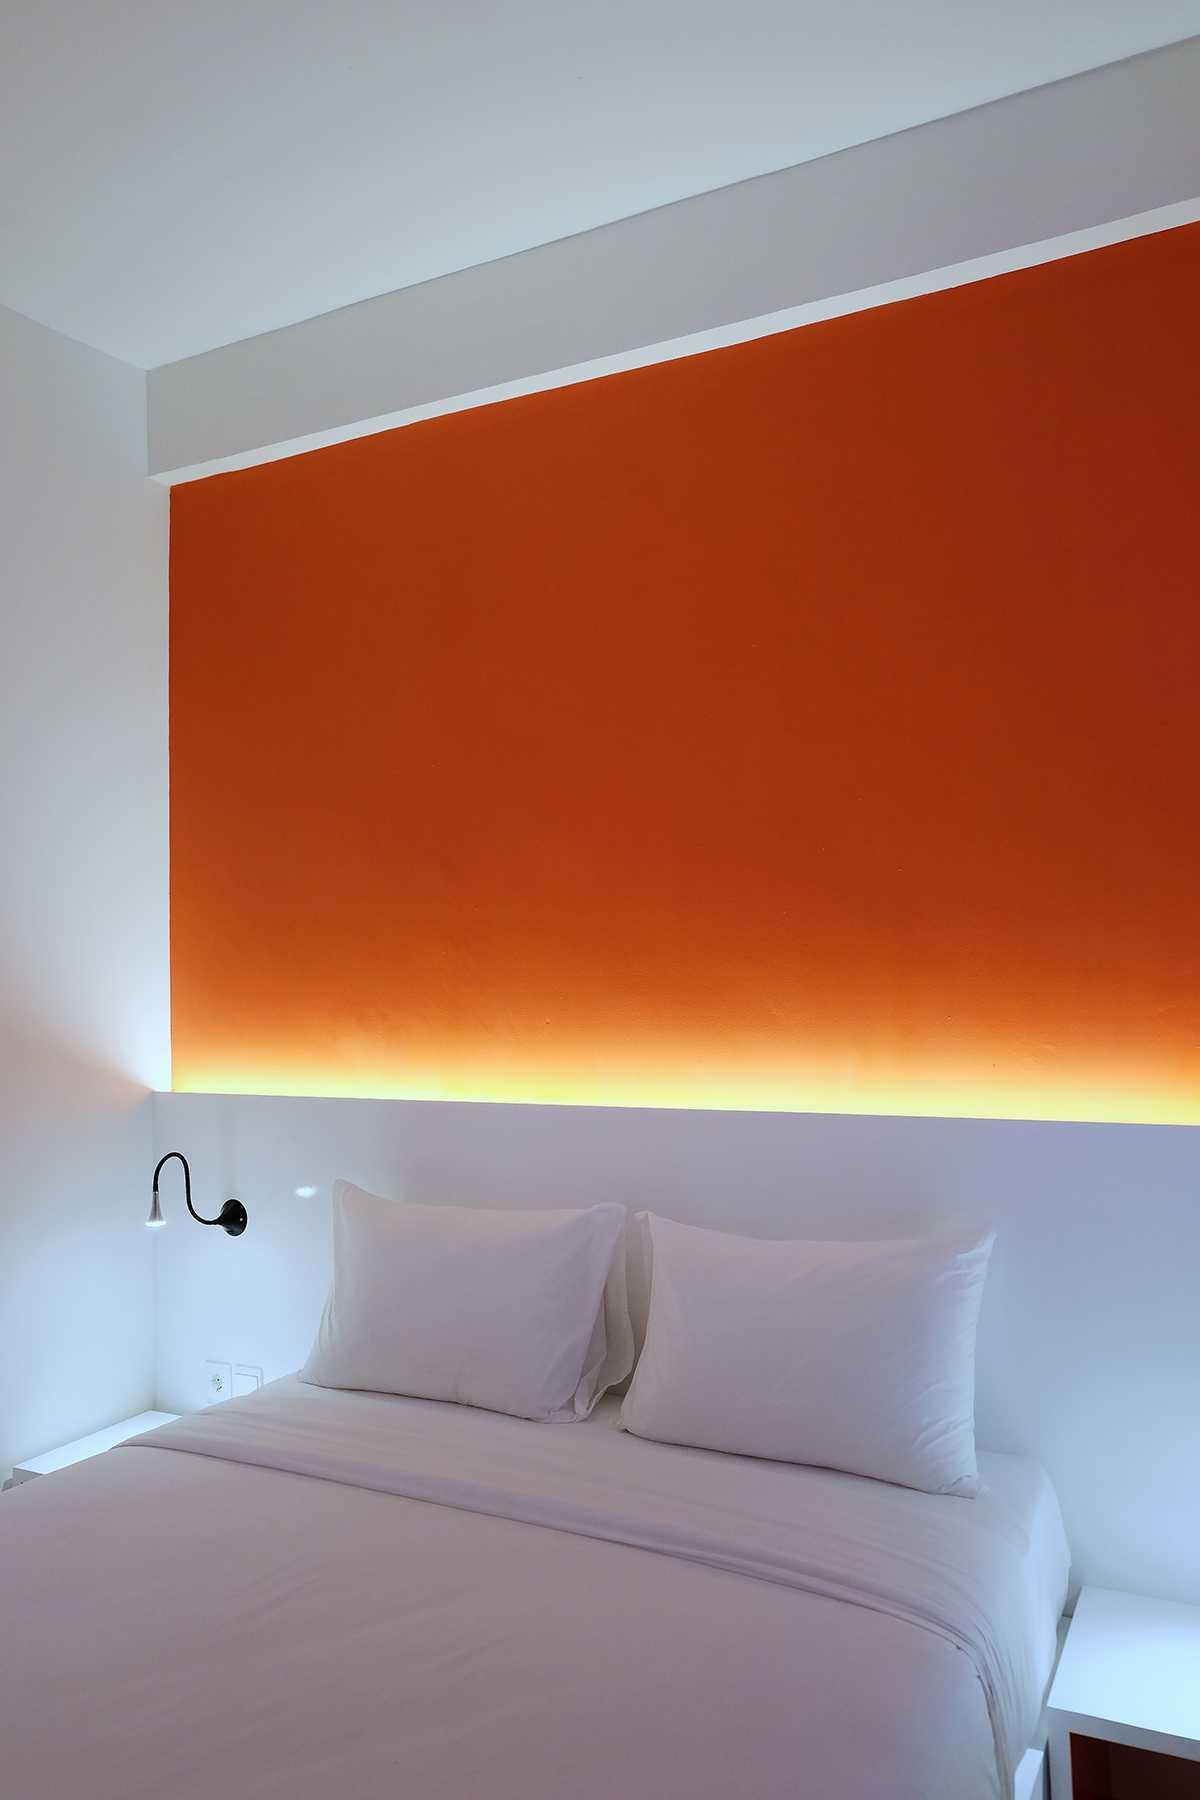 Xoa Design Starlet Hotel Cengkareng Jl. Atang Sanjaya, Benda, Kota Tangerang, Banten 15125, Indonesia Jl. Atang Sanjaya, Benda, Kota Tangerang, Banten 15125, Indonesia Xoa-Design-Starlet-Hotel-Cengkareng  73420